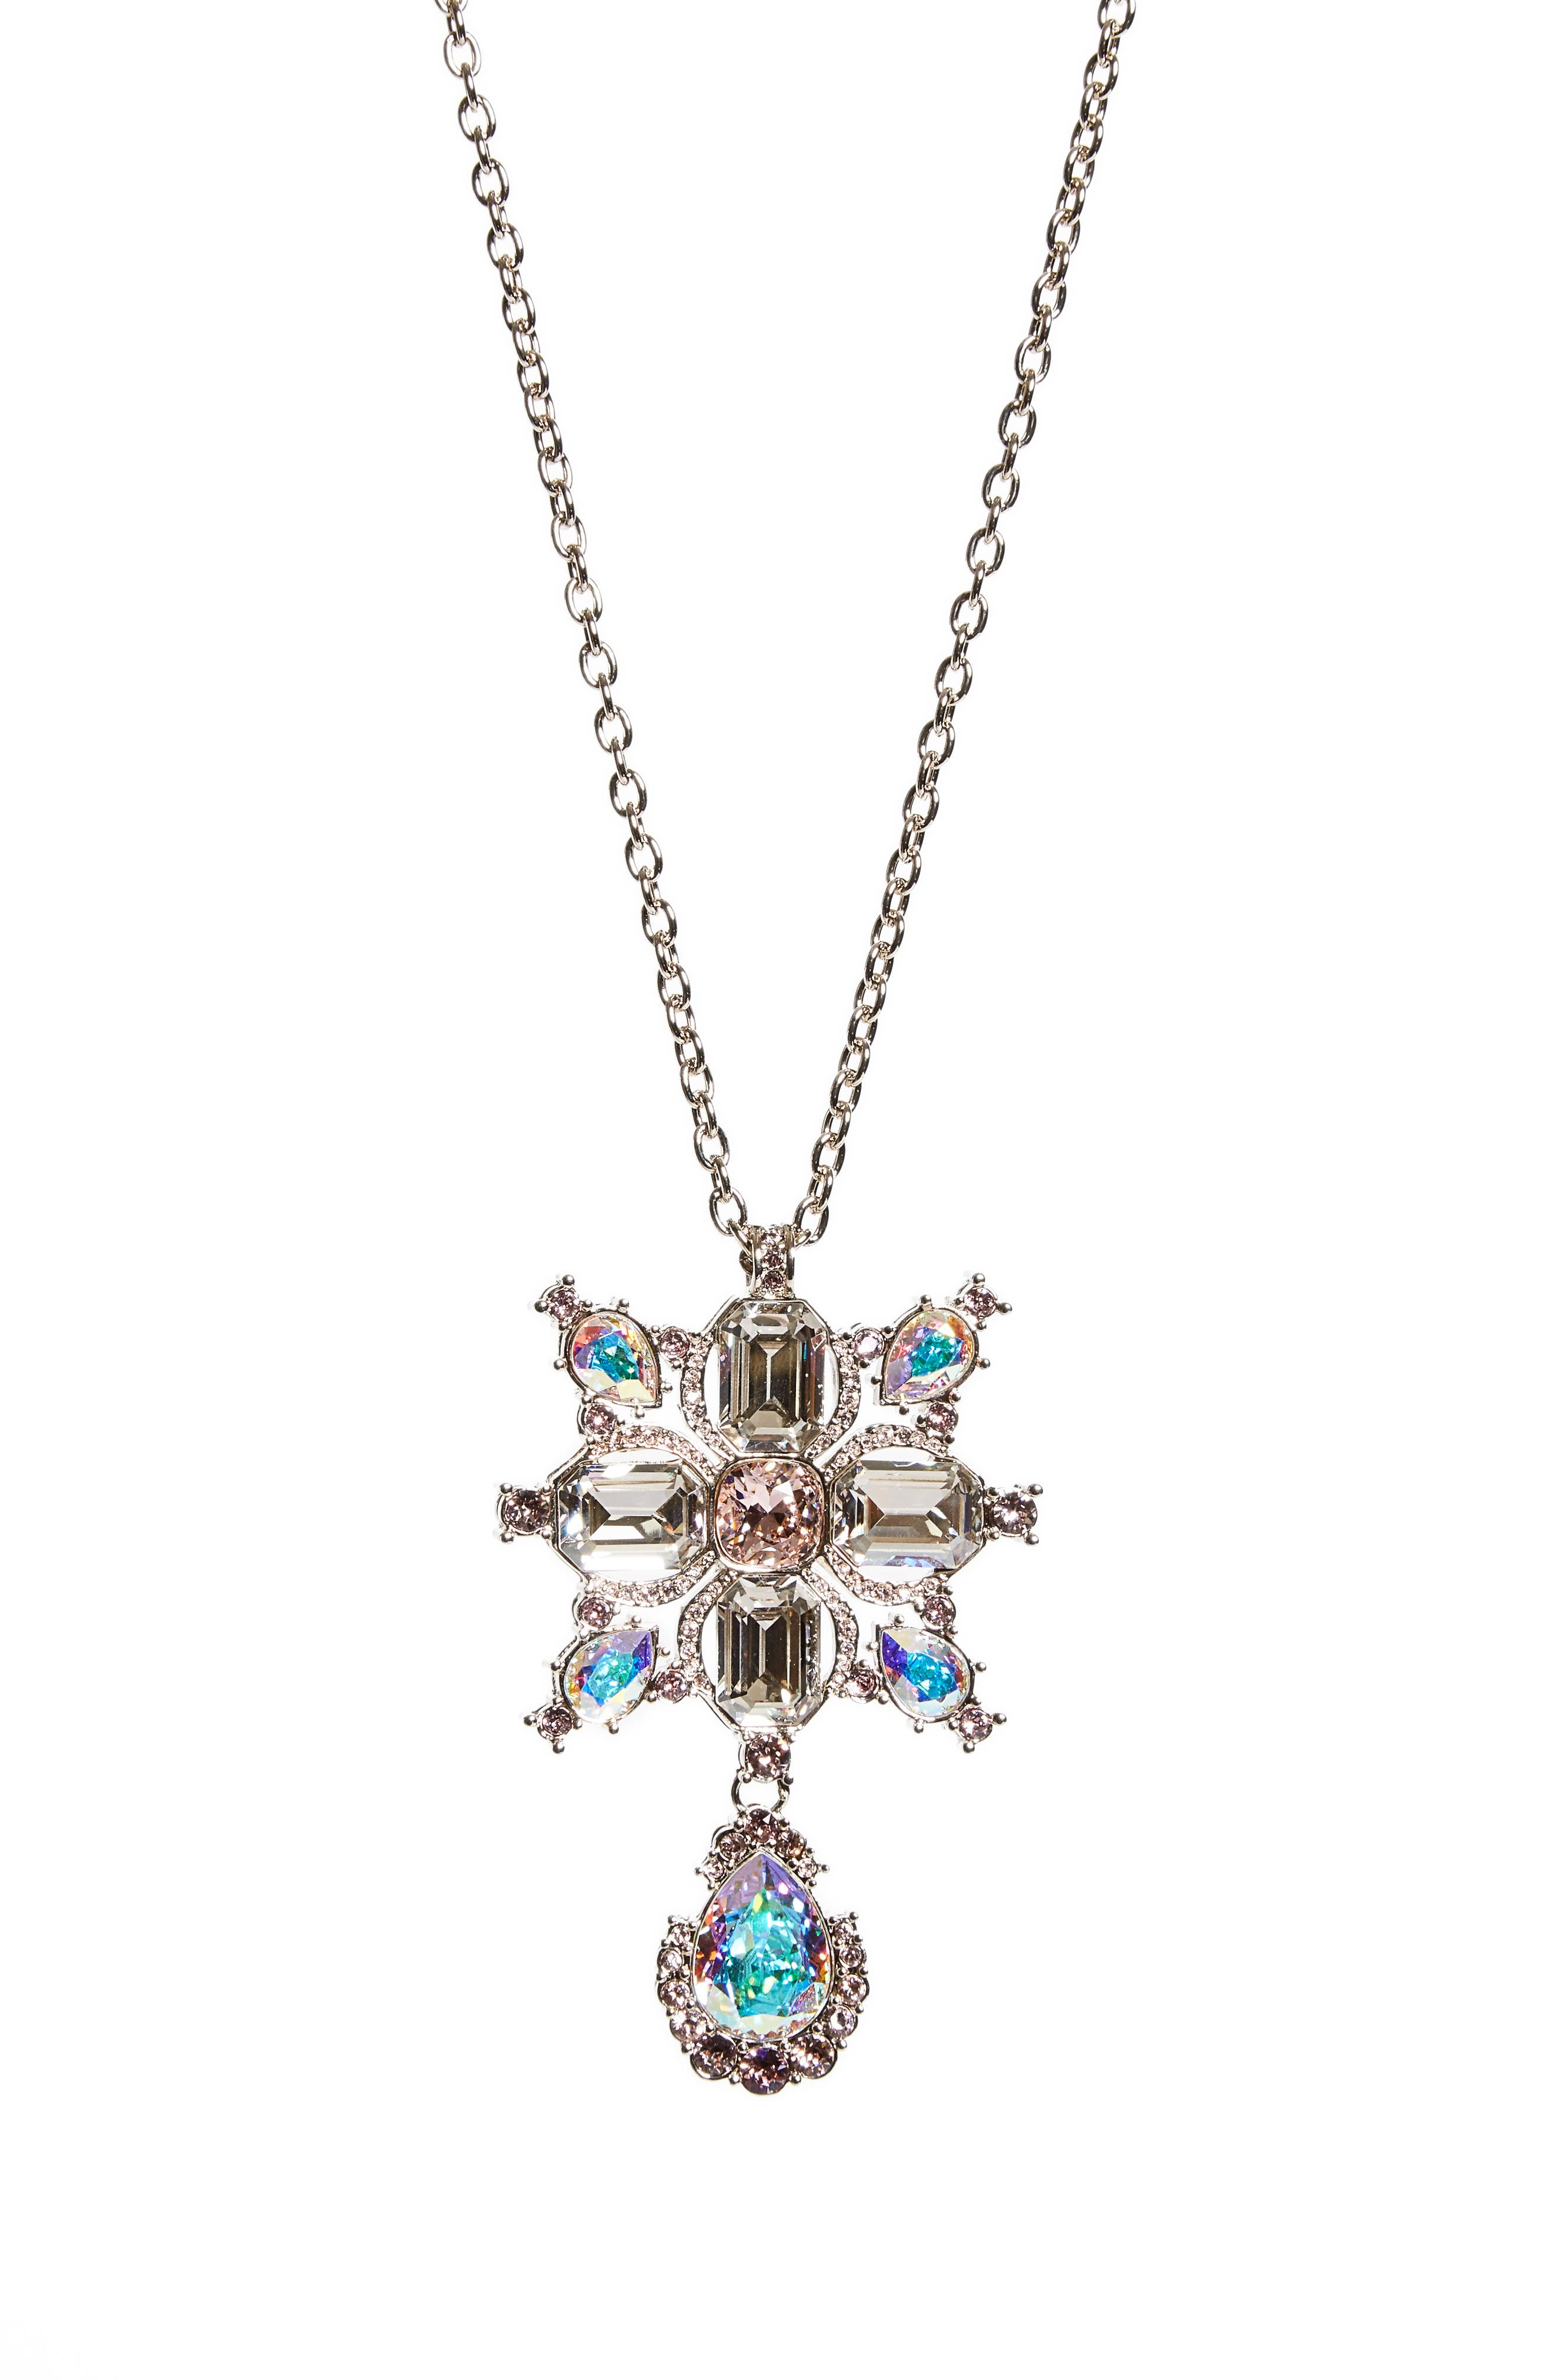 Swarovski Crystal Pendant Necklace,                             Main thumbnail 1, color,                             710